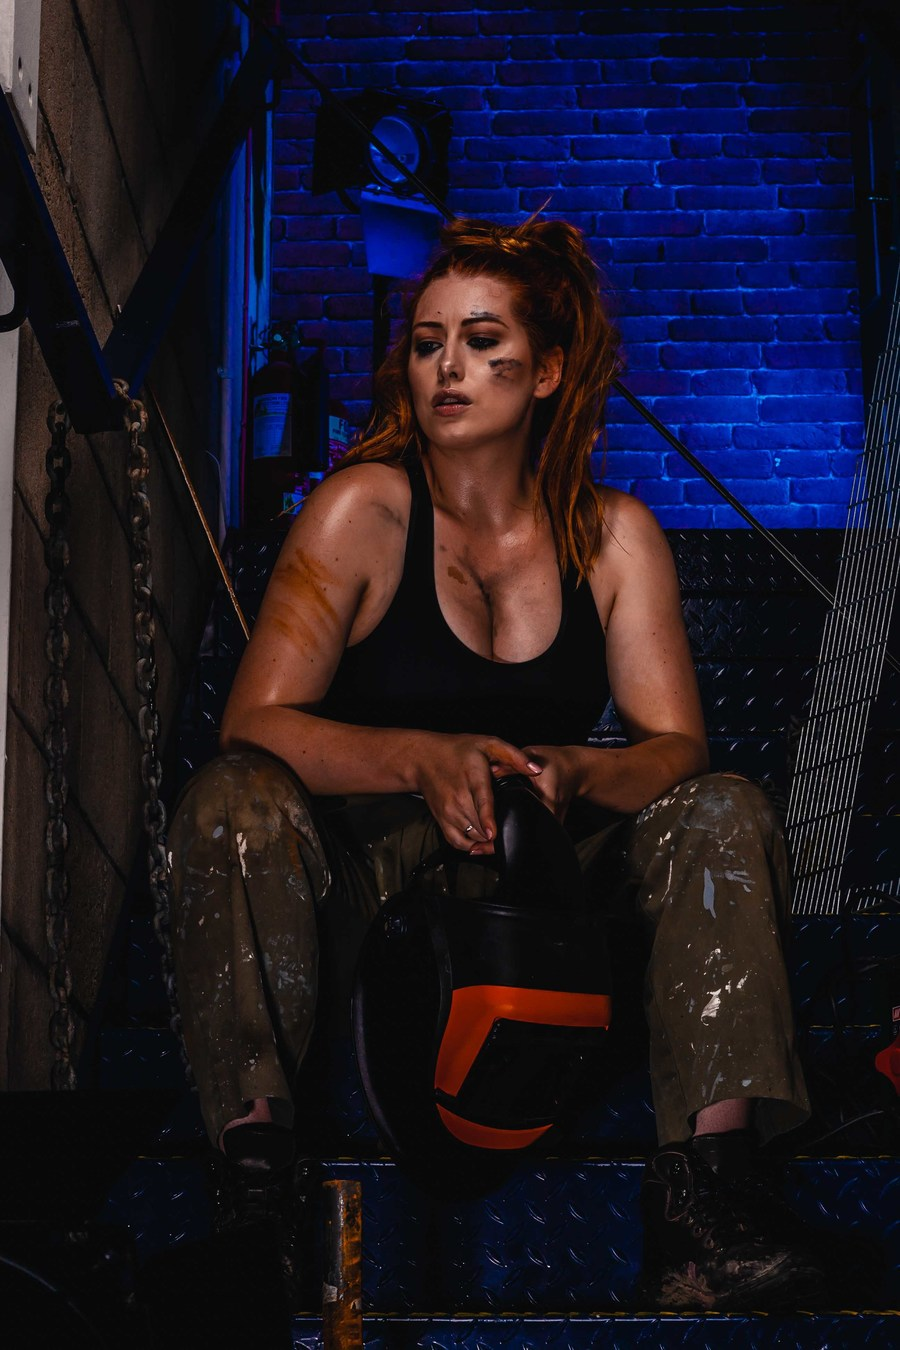 Photography by AyshiaScott, Model Sinopa Rin, Taken at Fareham Studio / Uploaded 26th November 2020 @ 08:44 PM